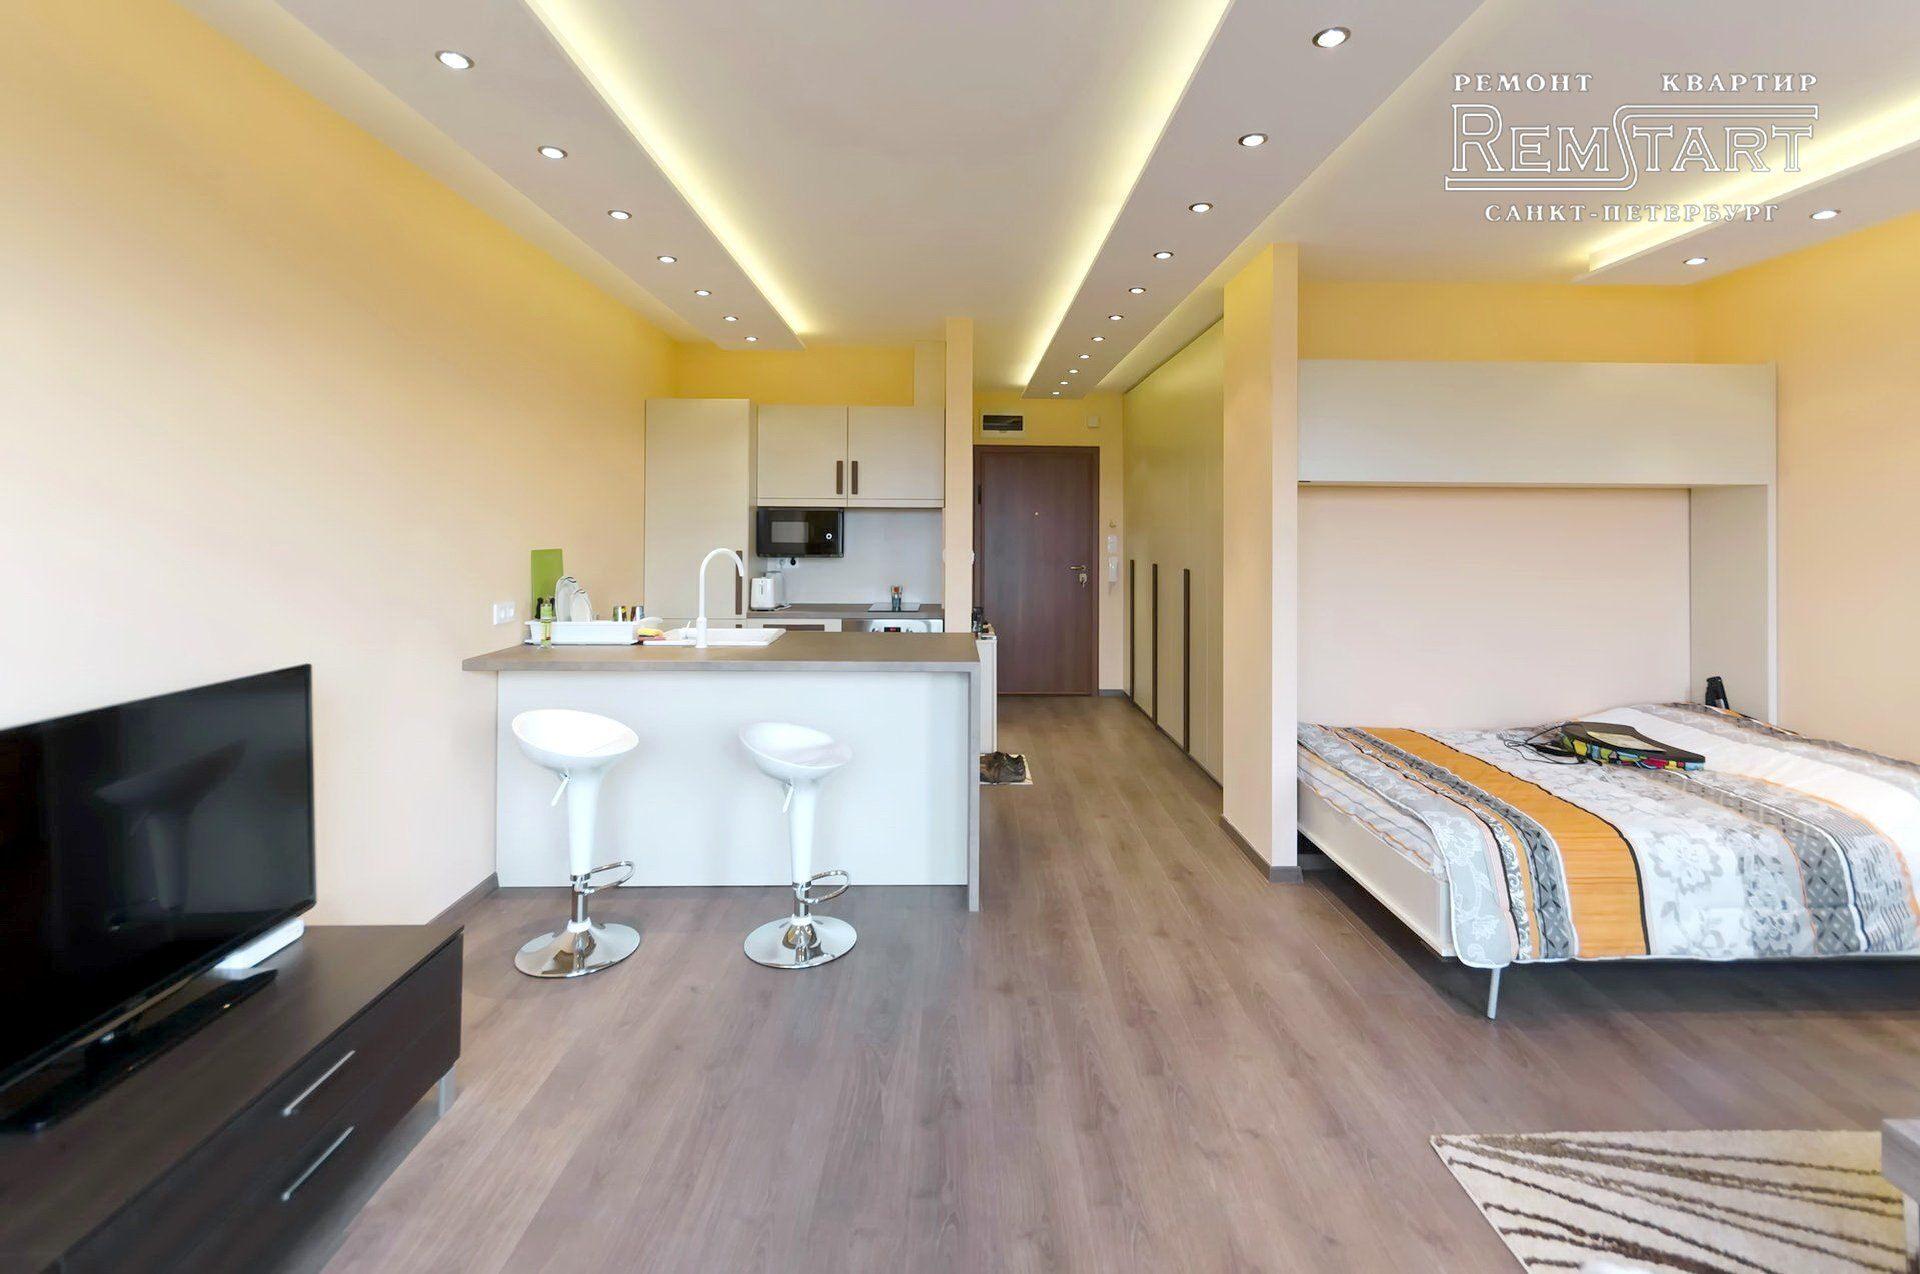 Дизайн и ремонт квартиры студии под ключ